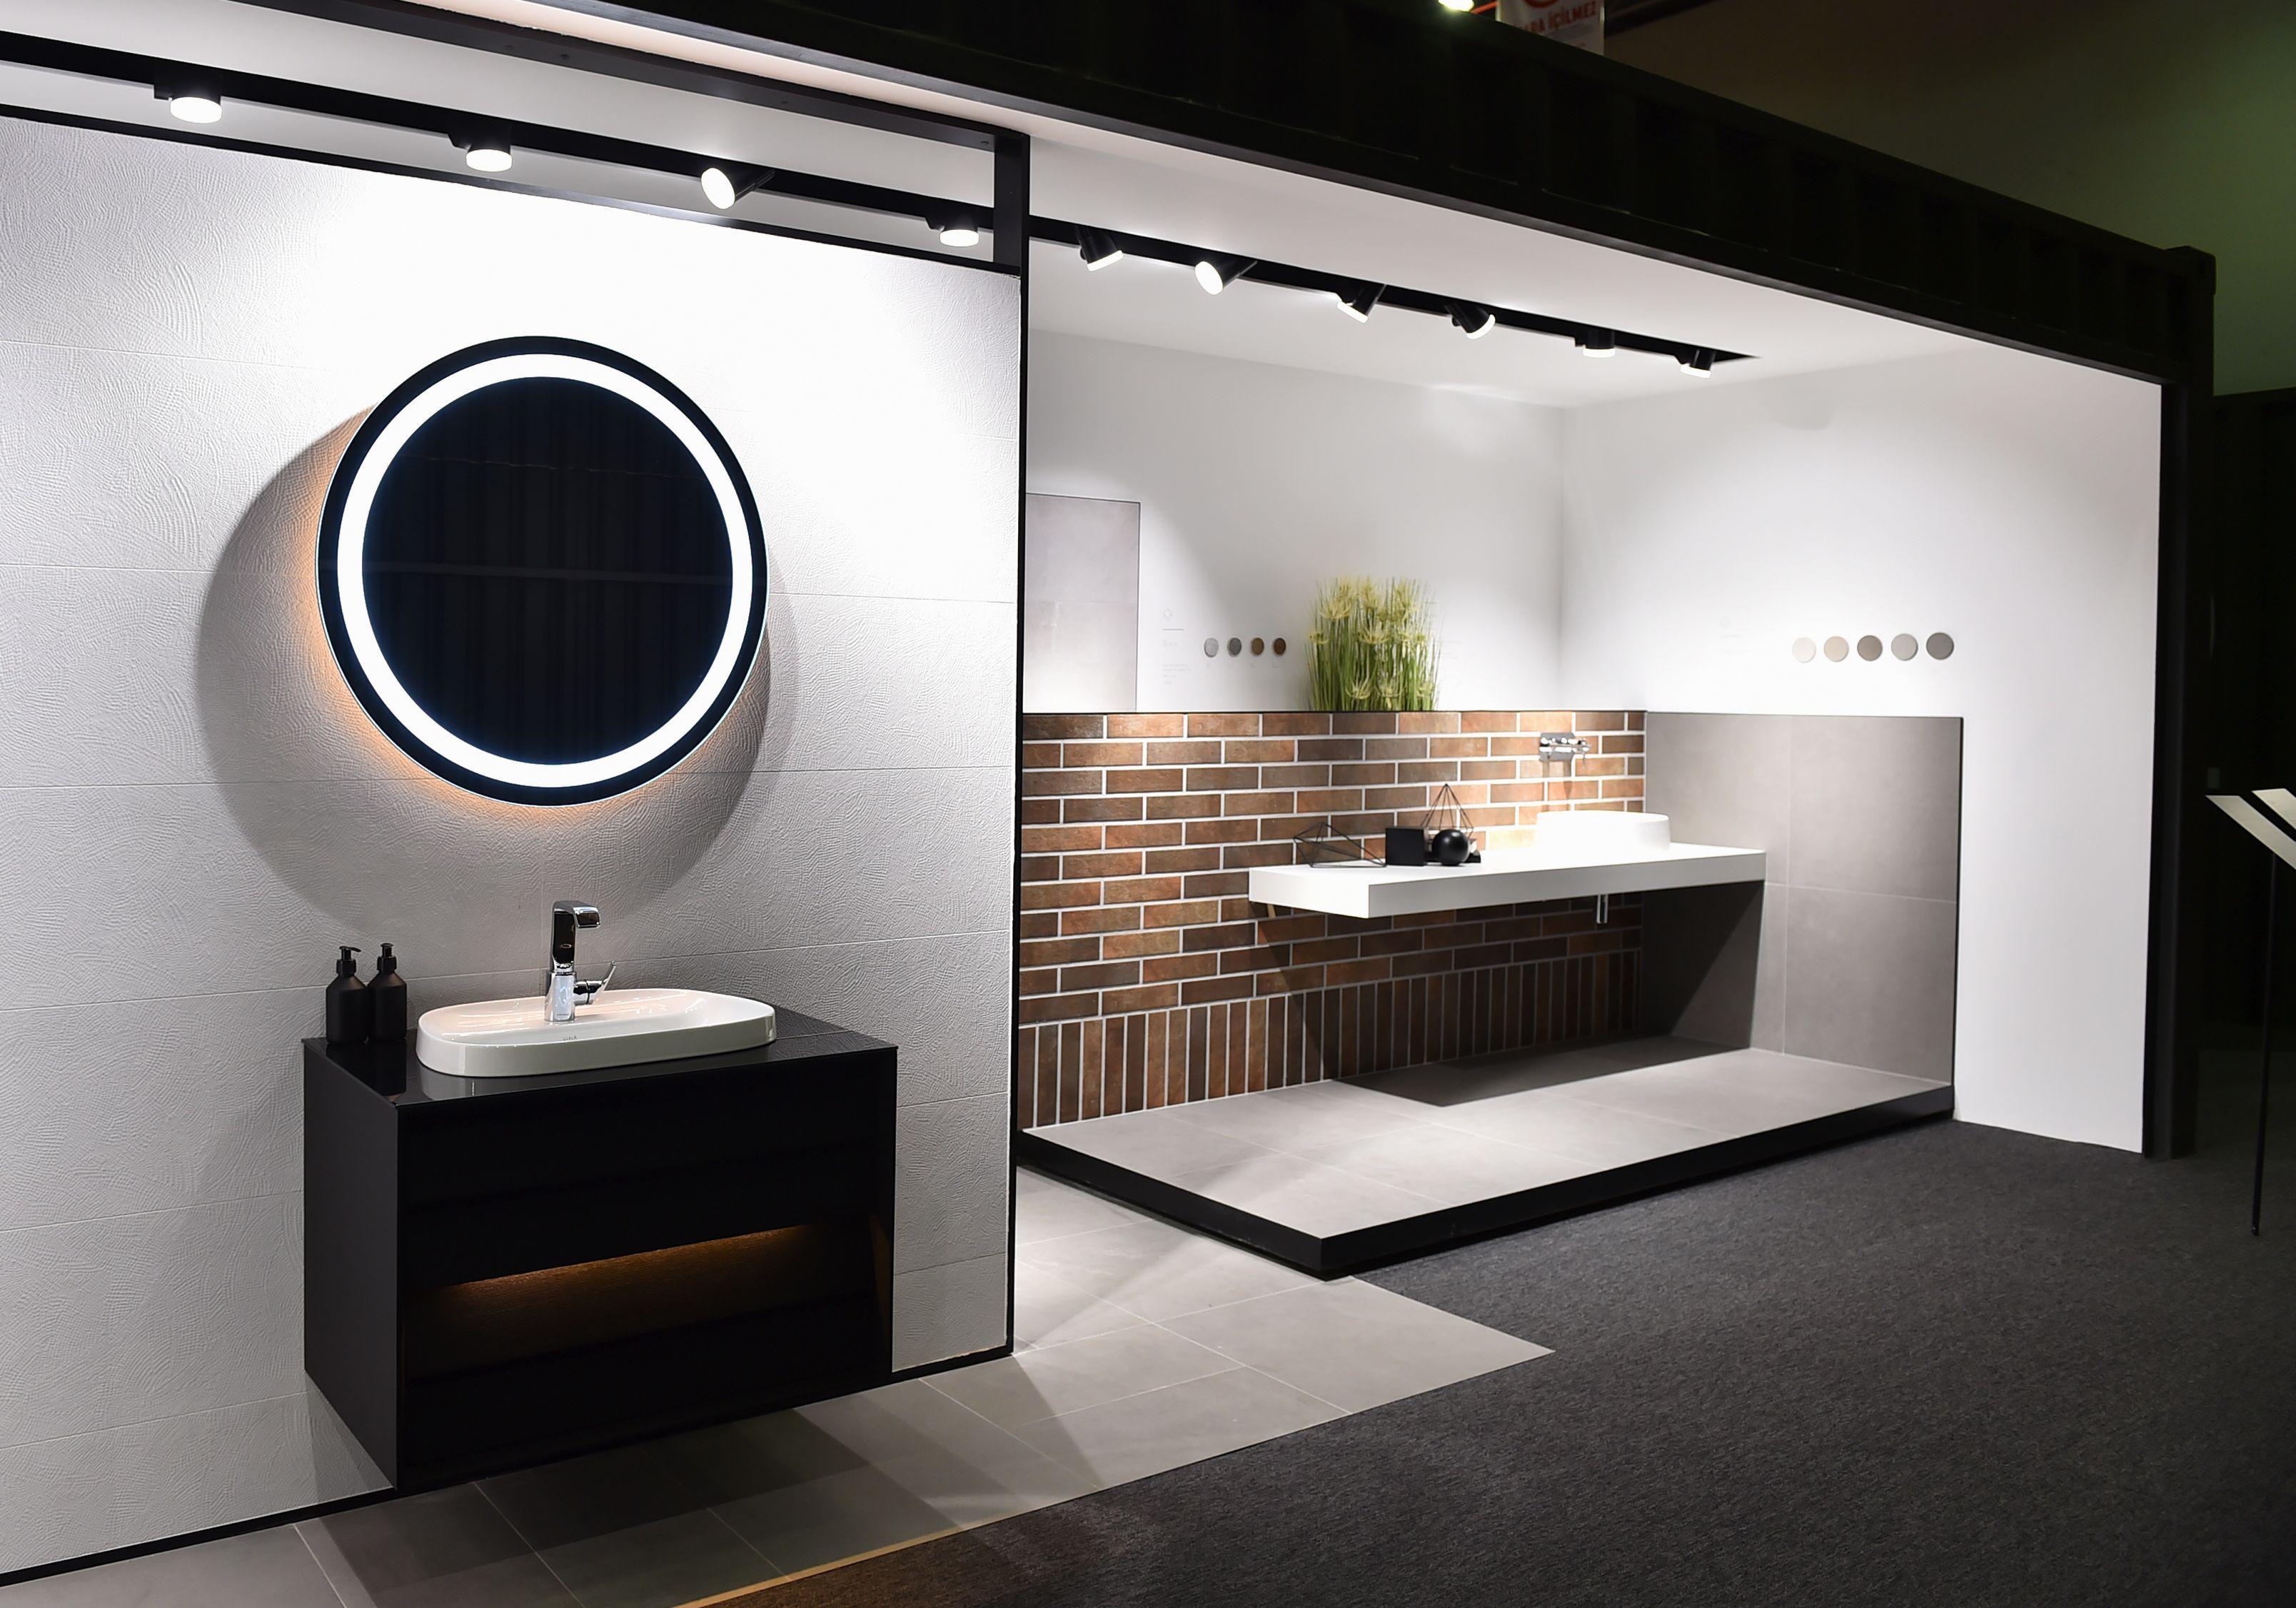 Vitra Unicera 2018 Bathroomshowrooms Bathroom Inspiration Modern Zen Bathroom Design